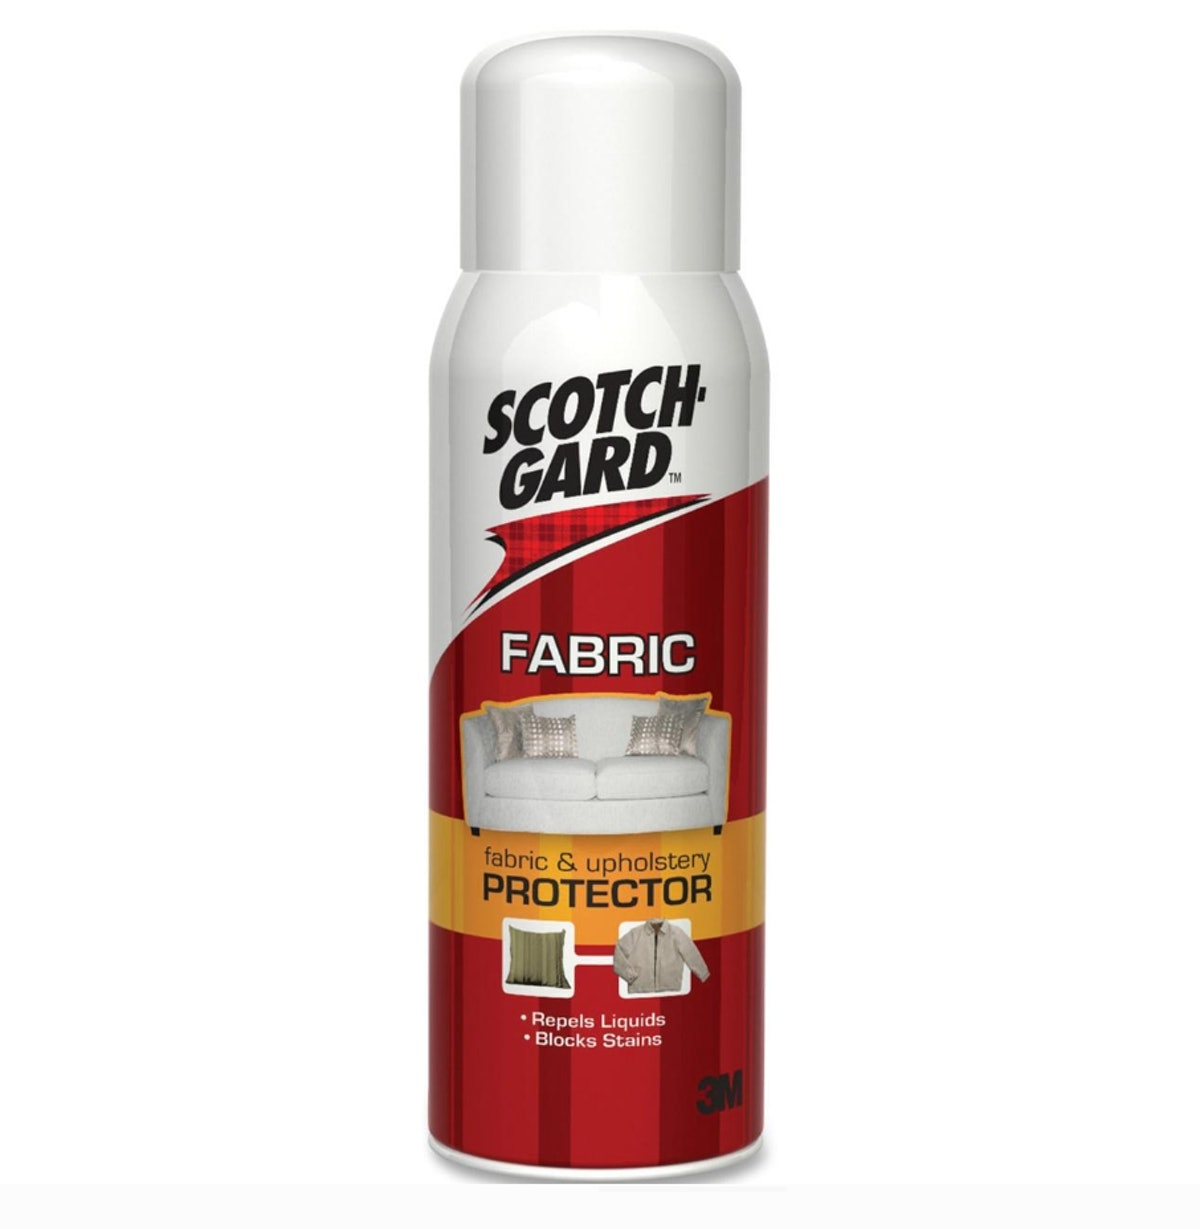 Scotchgard Fabric and Upholstery Protective Spray, 10 oz